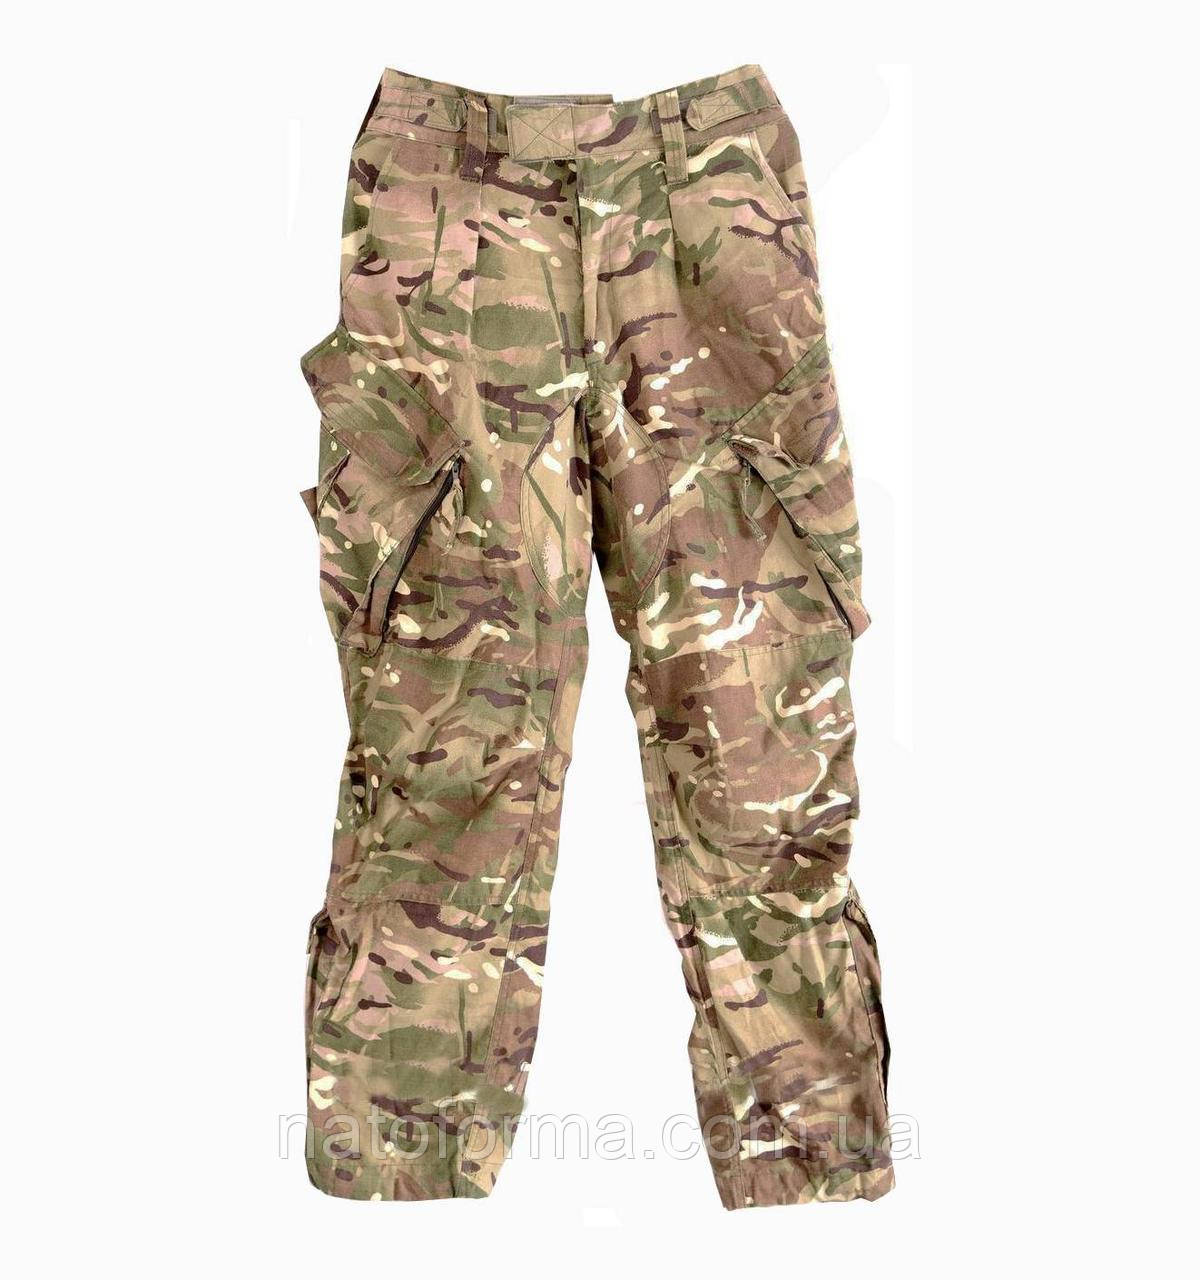 Огнеупорные брюки армии Великобритании Trousers Combat FR for Air Crew, б/у